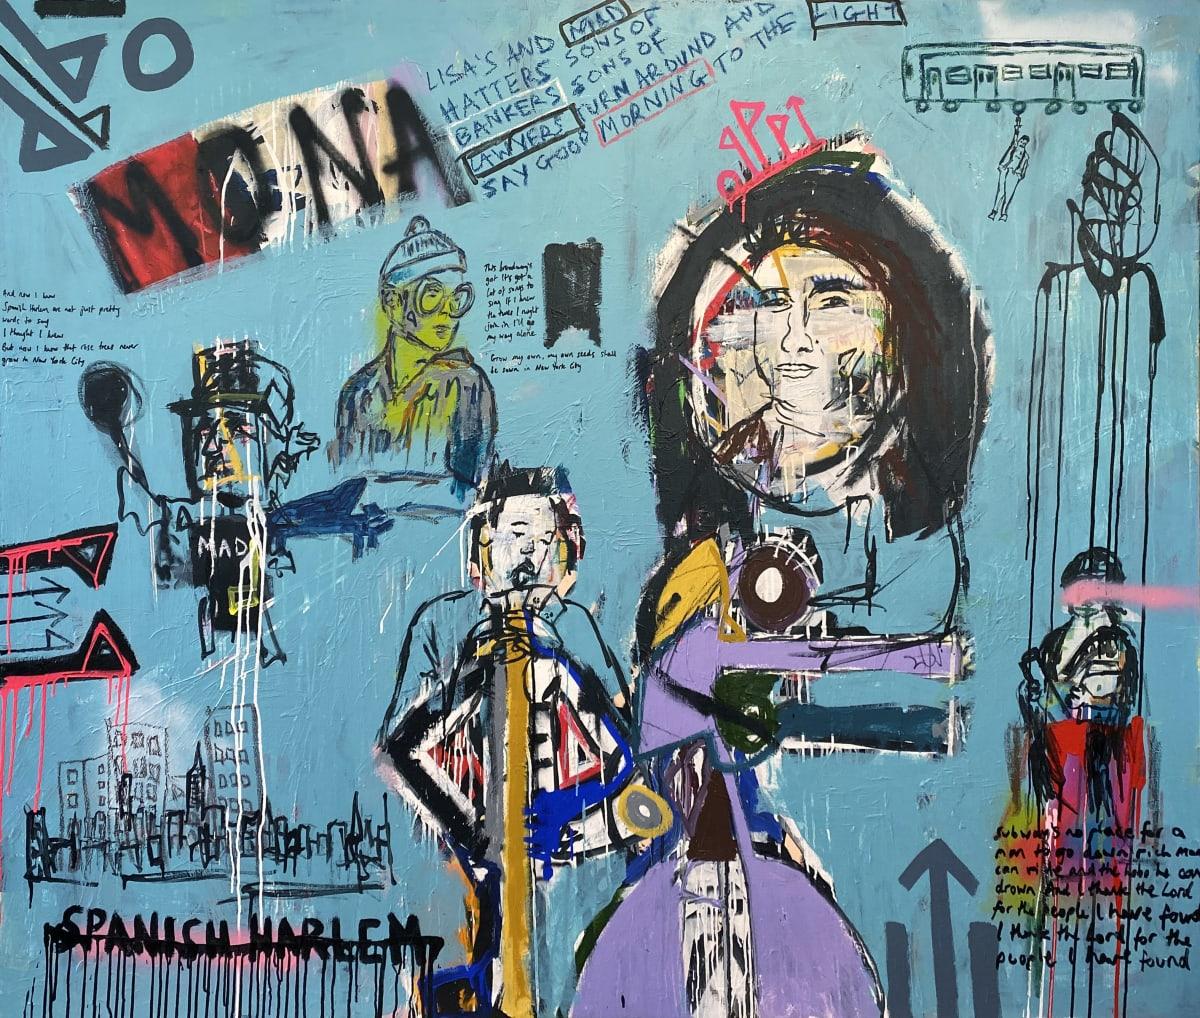 JP Jones, Mona Lisas and Mad Hatters (by Elton John), 2019